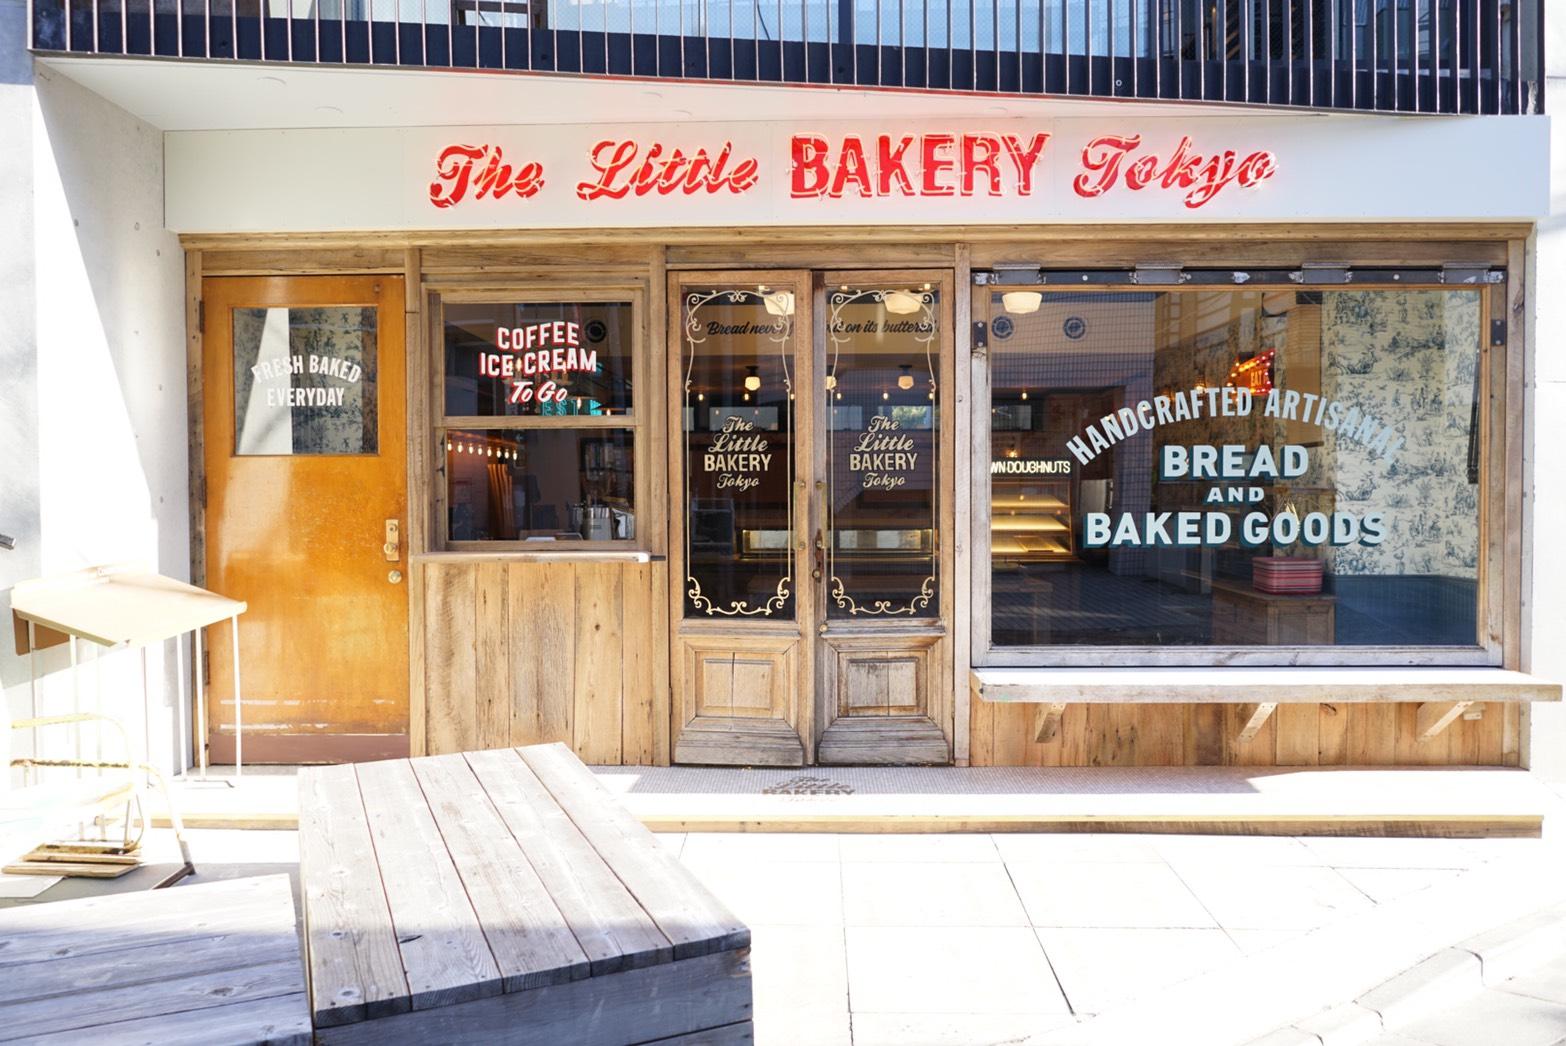 「The Little BAKERY Tokyo(ザ リトル ベーカリー トウキョウ)」 (1)